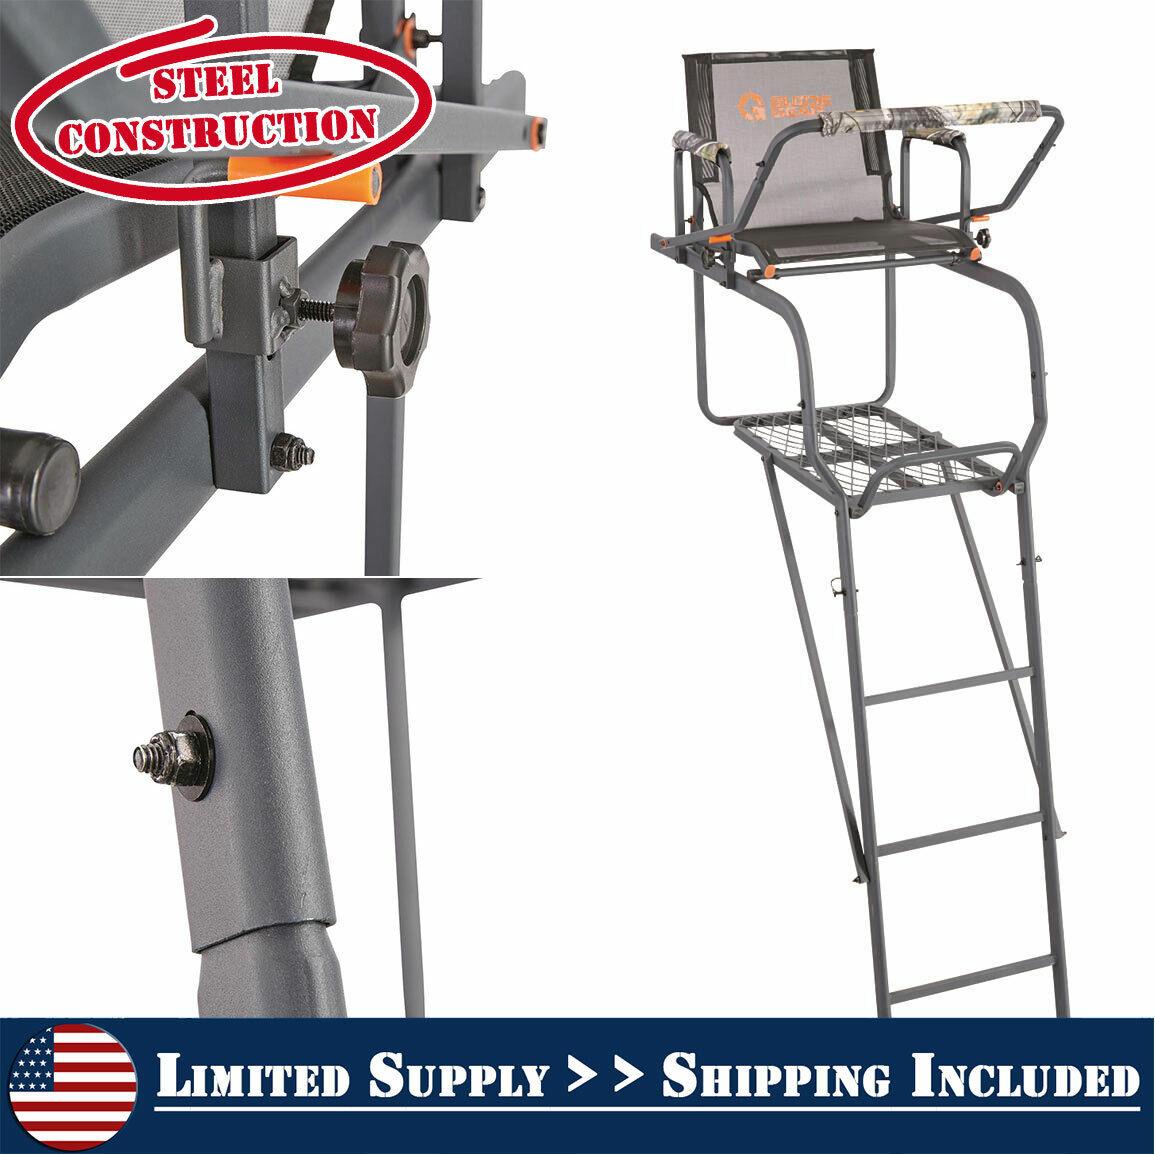 Ladder Tree Stand 15.5 feet Game Gun Bow Hunting Archery Dee